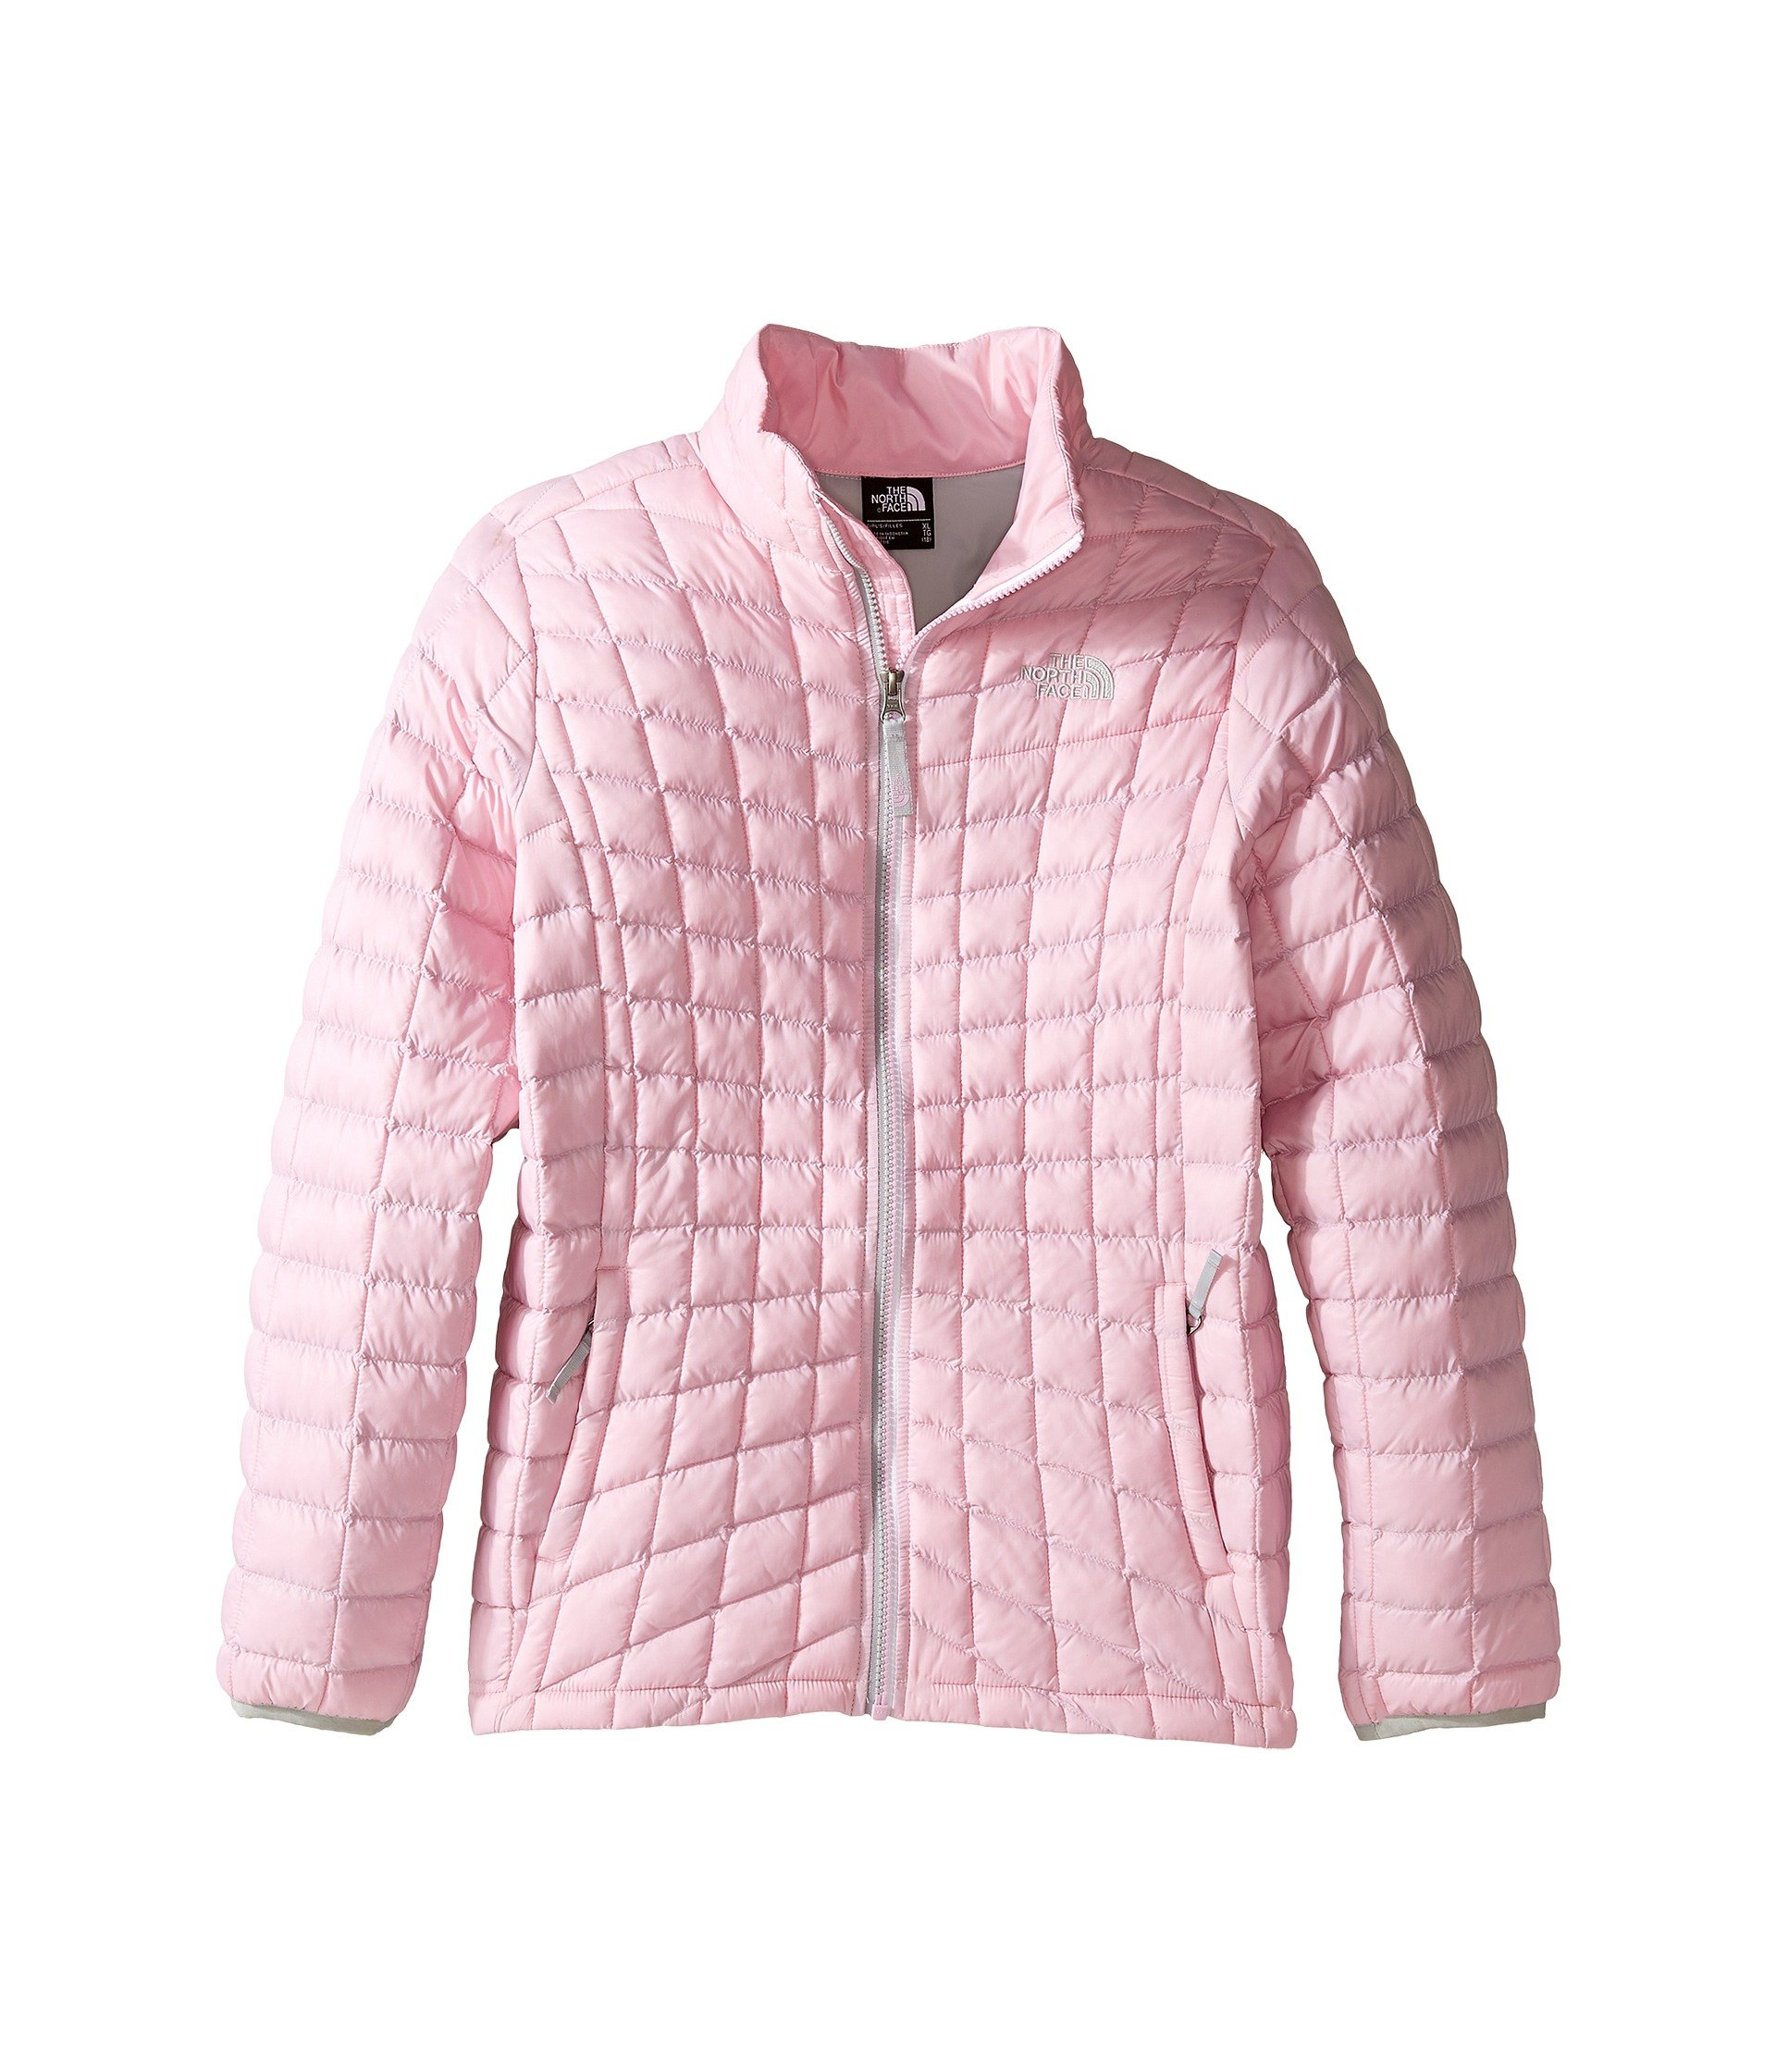 9dc0c4b784 Galleon - The North Face Kids Girl s Thermoball Full Zip Jacket (Little Kids Big  Kids) Lilac Sachet Pink (Prior Season) Medium